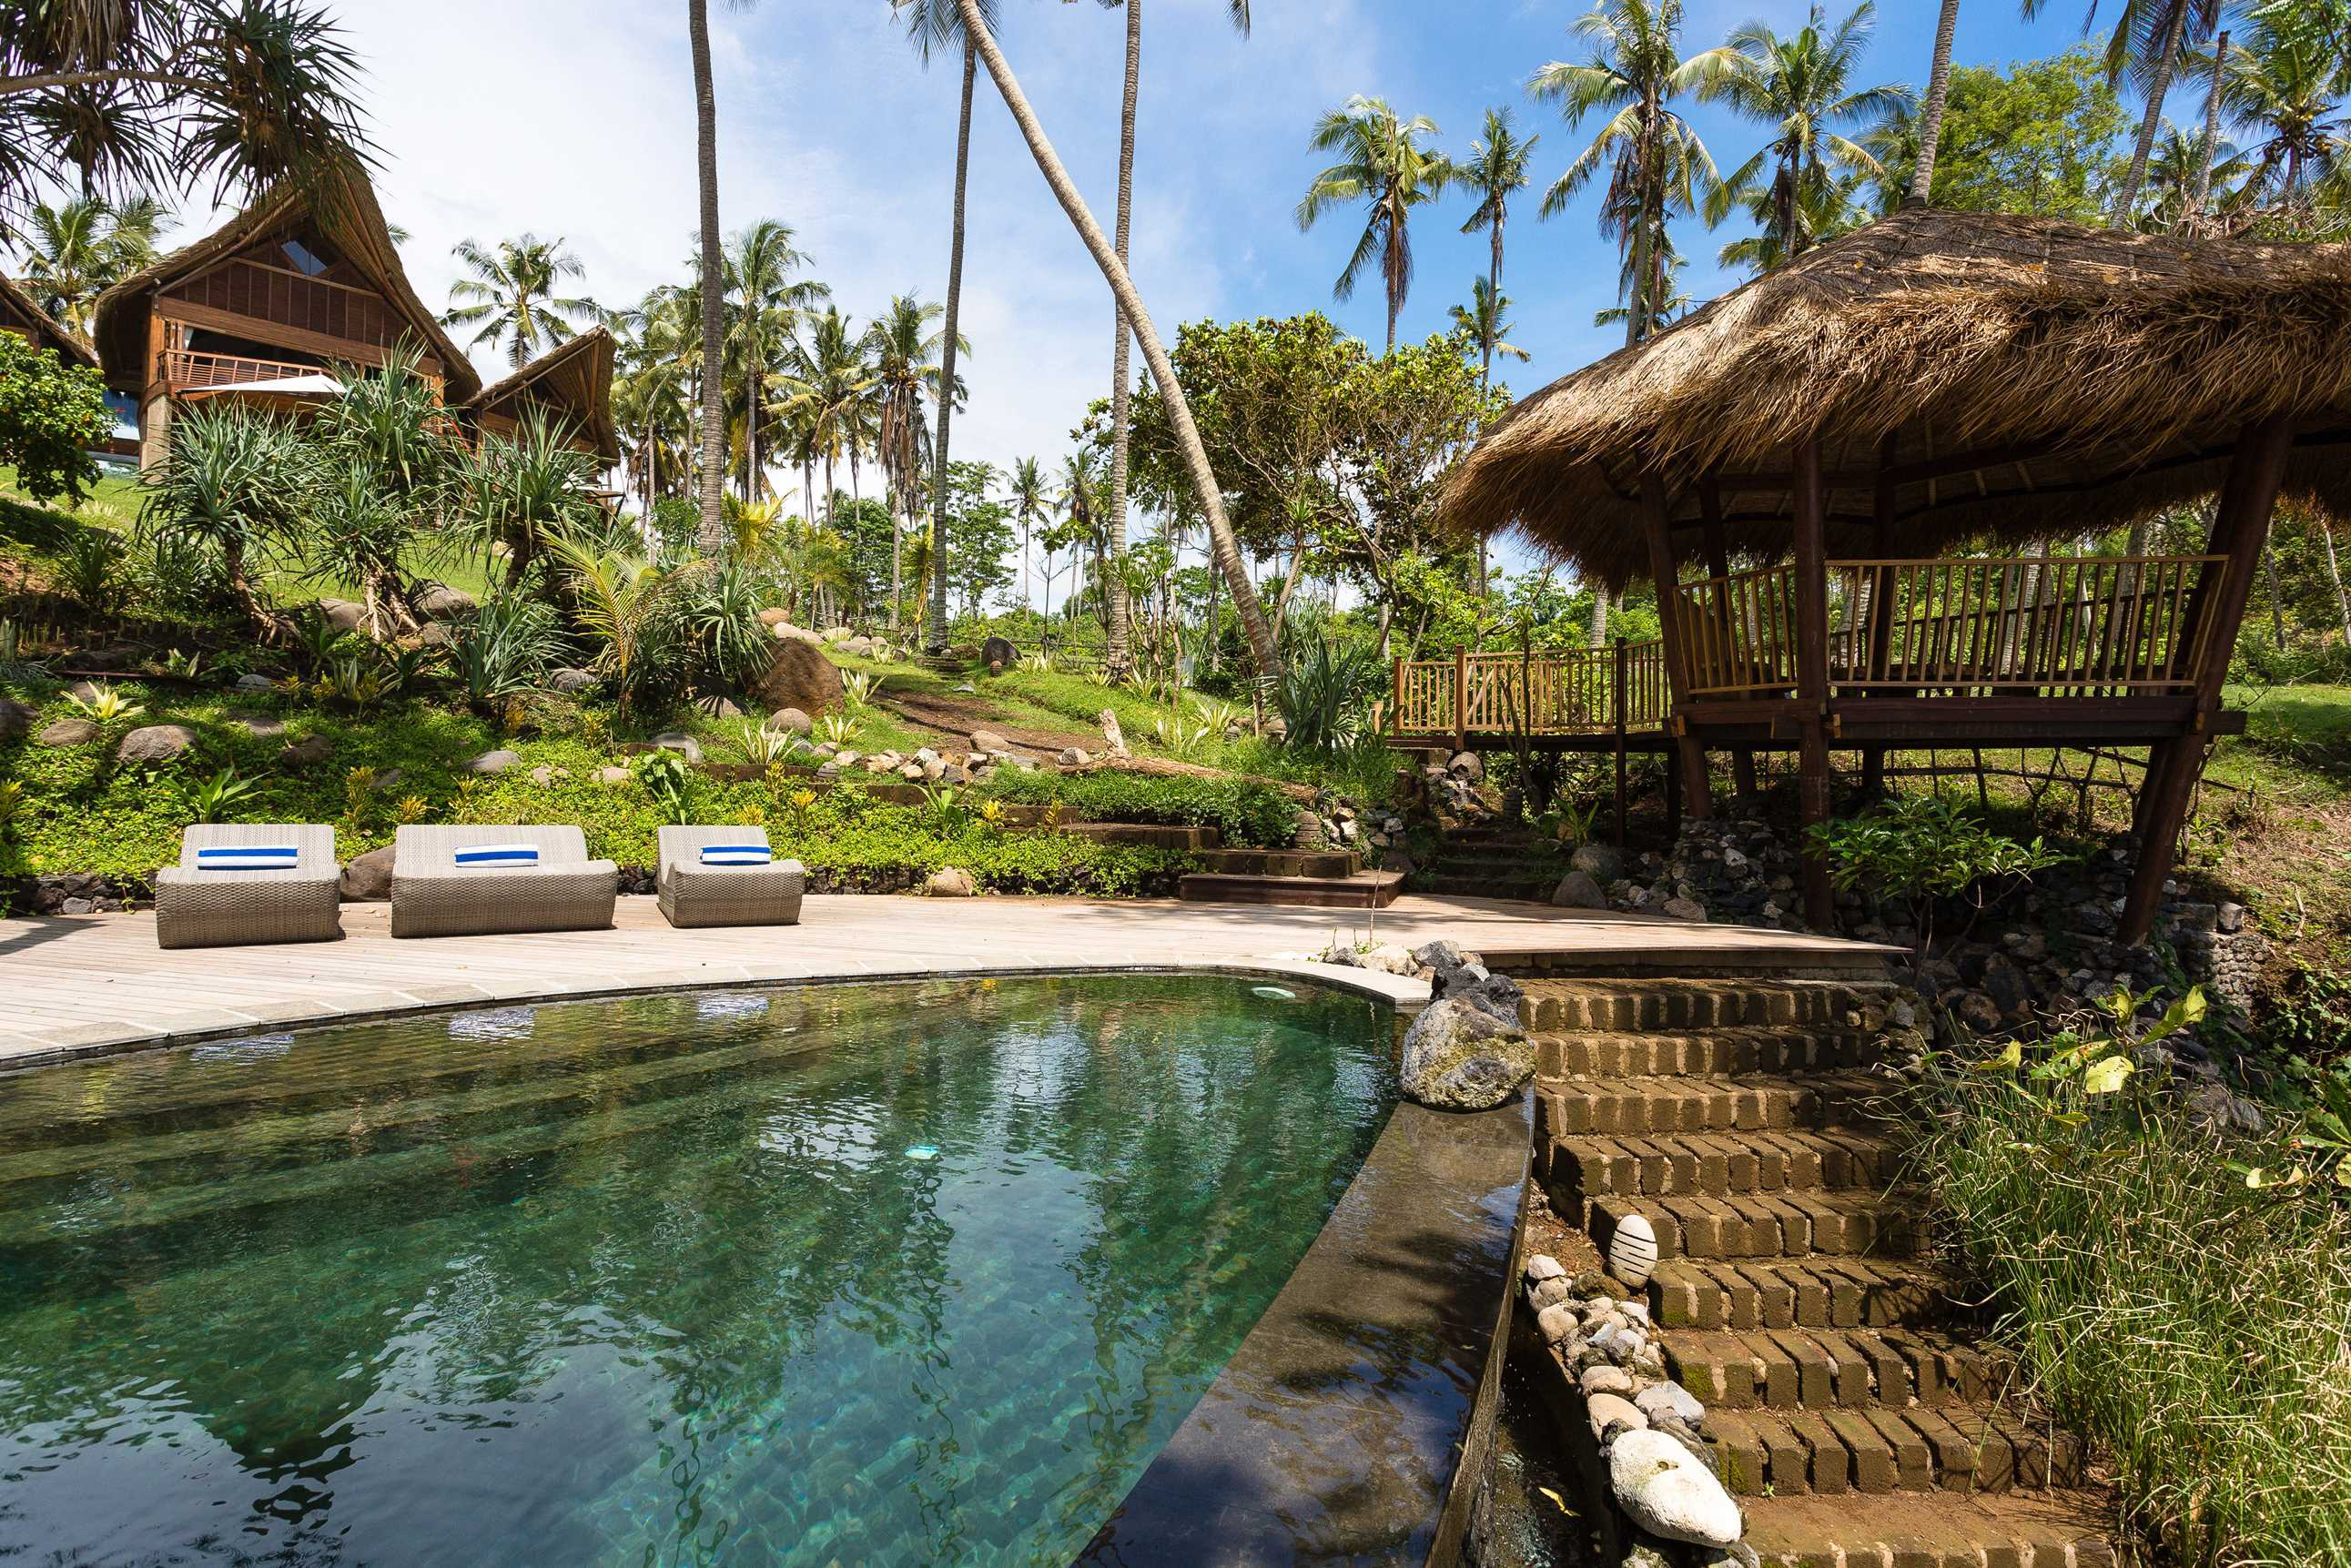 Inspiralarchitects The Cove Antap, Selemadeg, Tabanan Regency, Bali, Indonesia Antap, Selemadeg, Tabanan Regency, Bali, Indonesia Thecove-36   33820